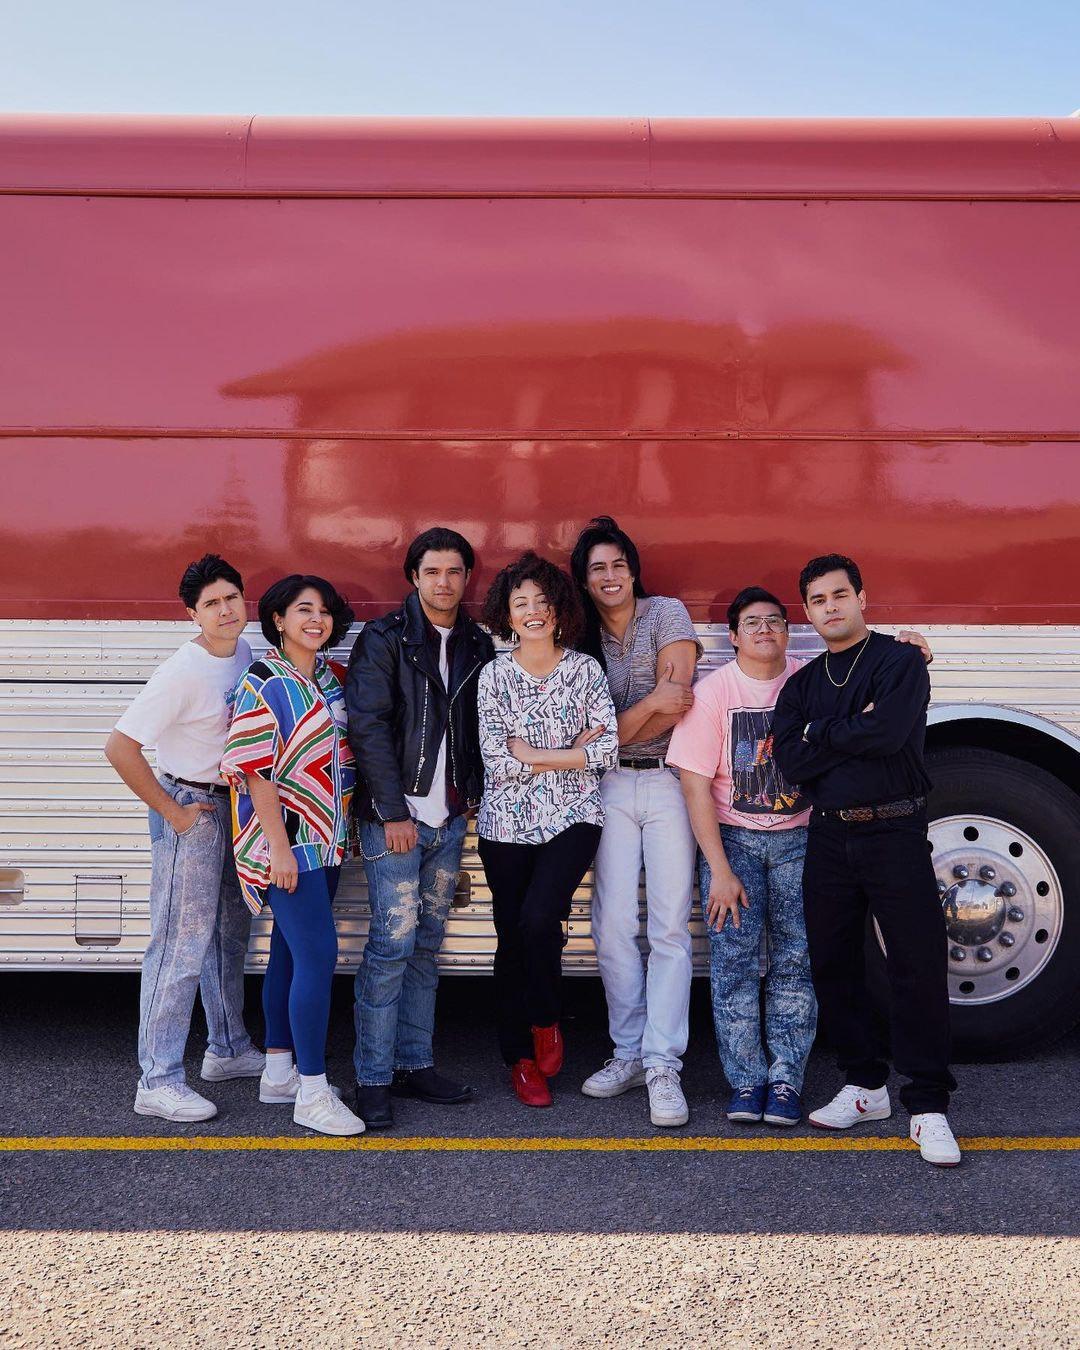 Selena LA SERIE Logros de una familia México-Americana